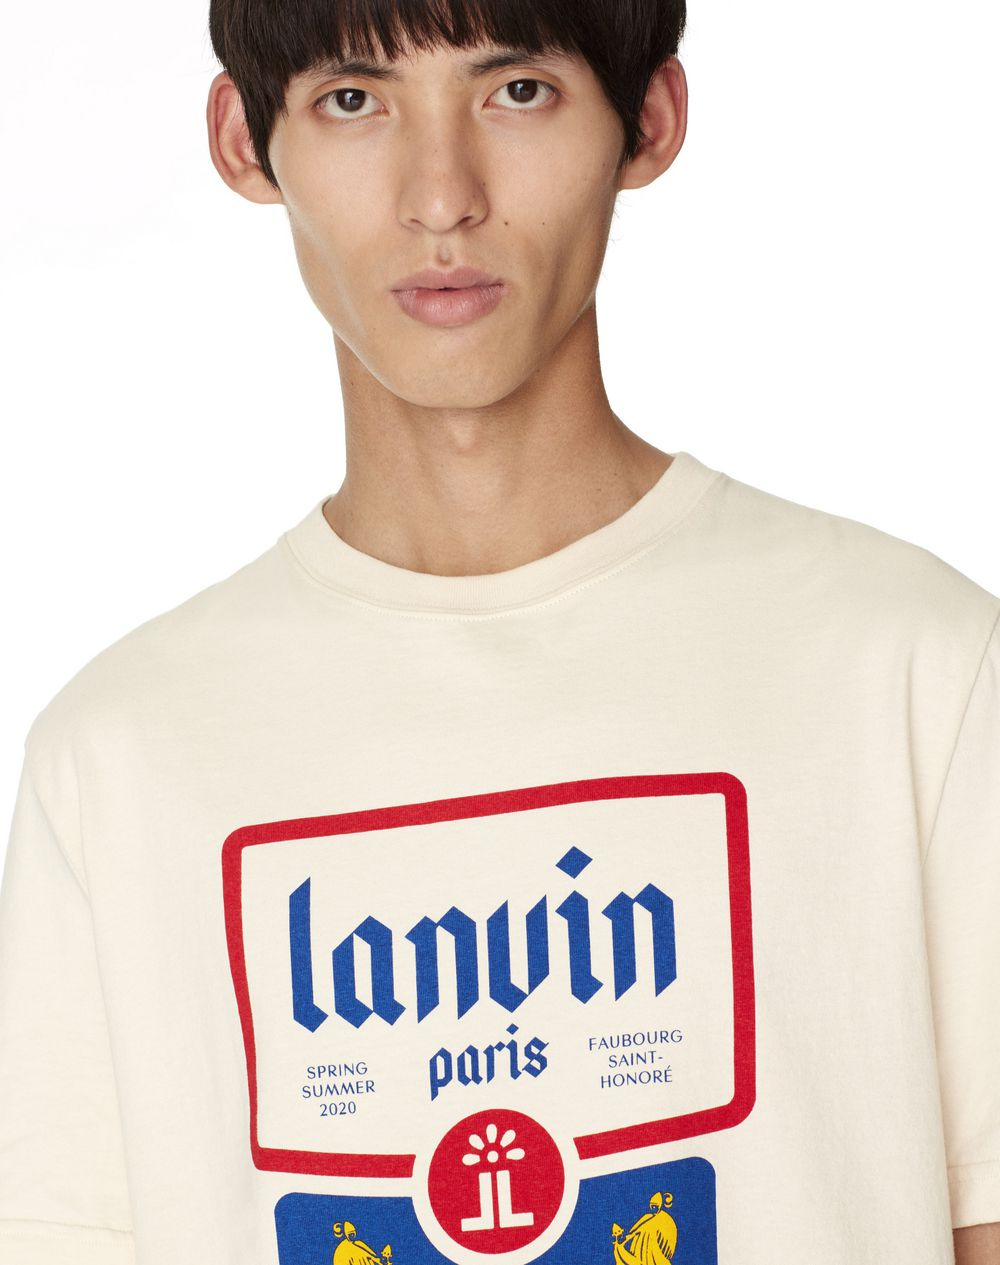 T-SHIRT CON STAMPA LANVIN - Lanvin